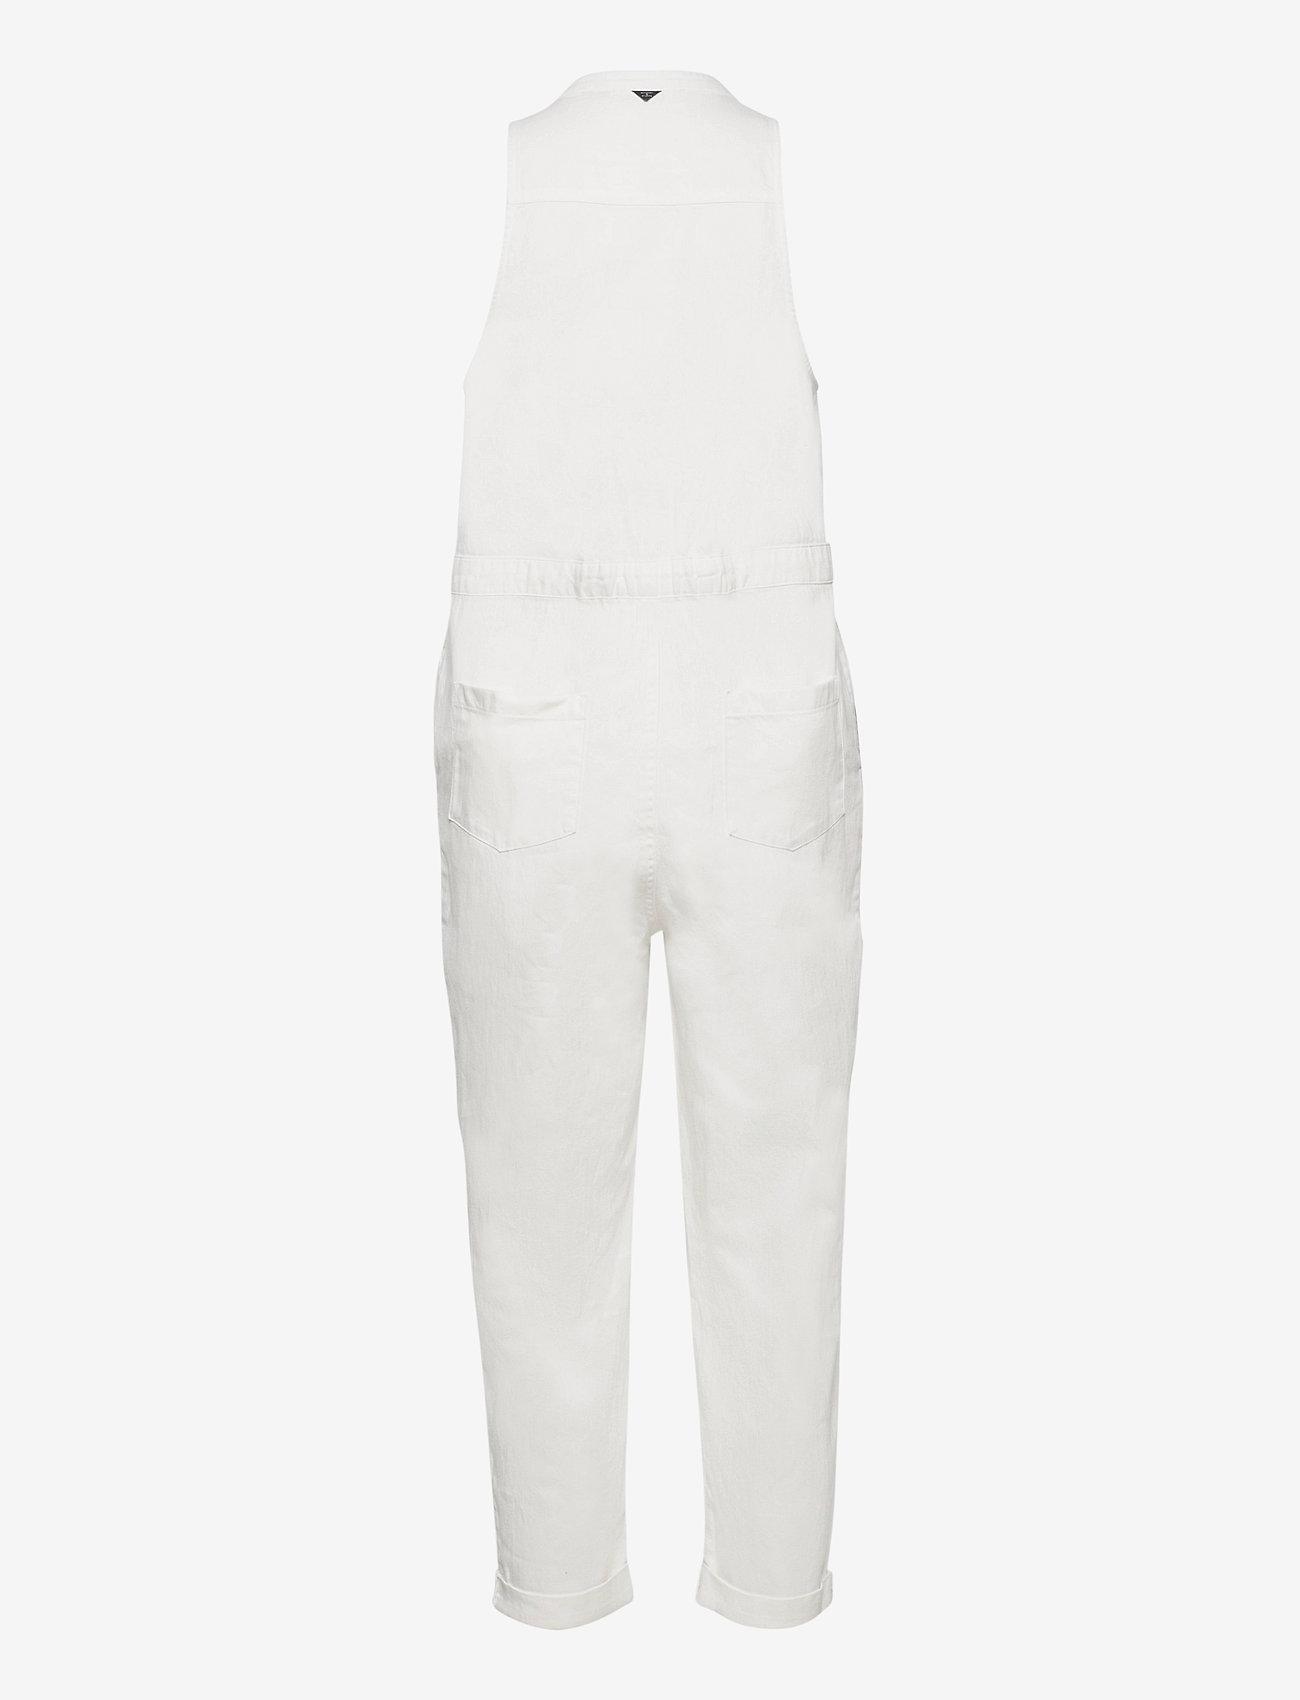 Superdry - SLEEVELESS JUMPSUIT - kleding - natural wash - 1